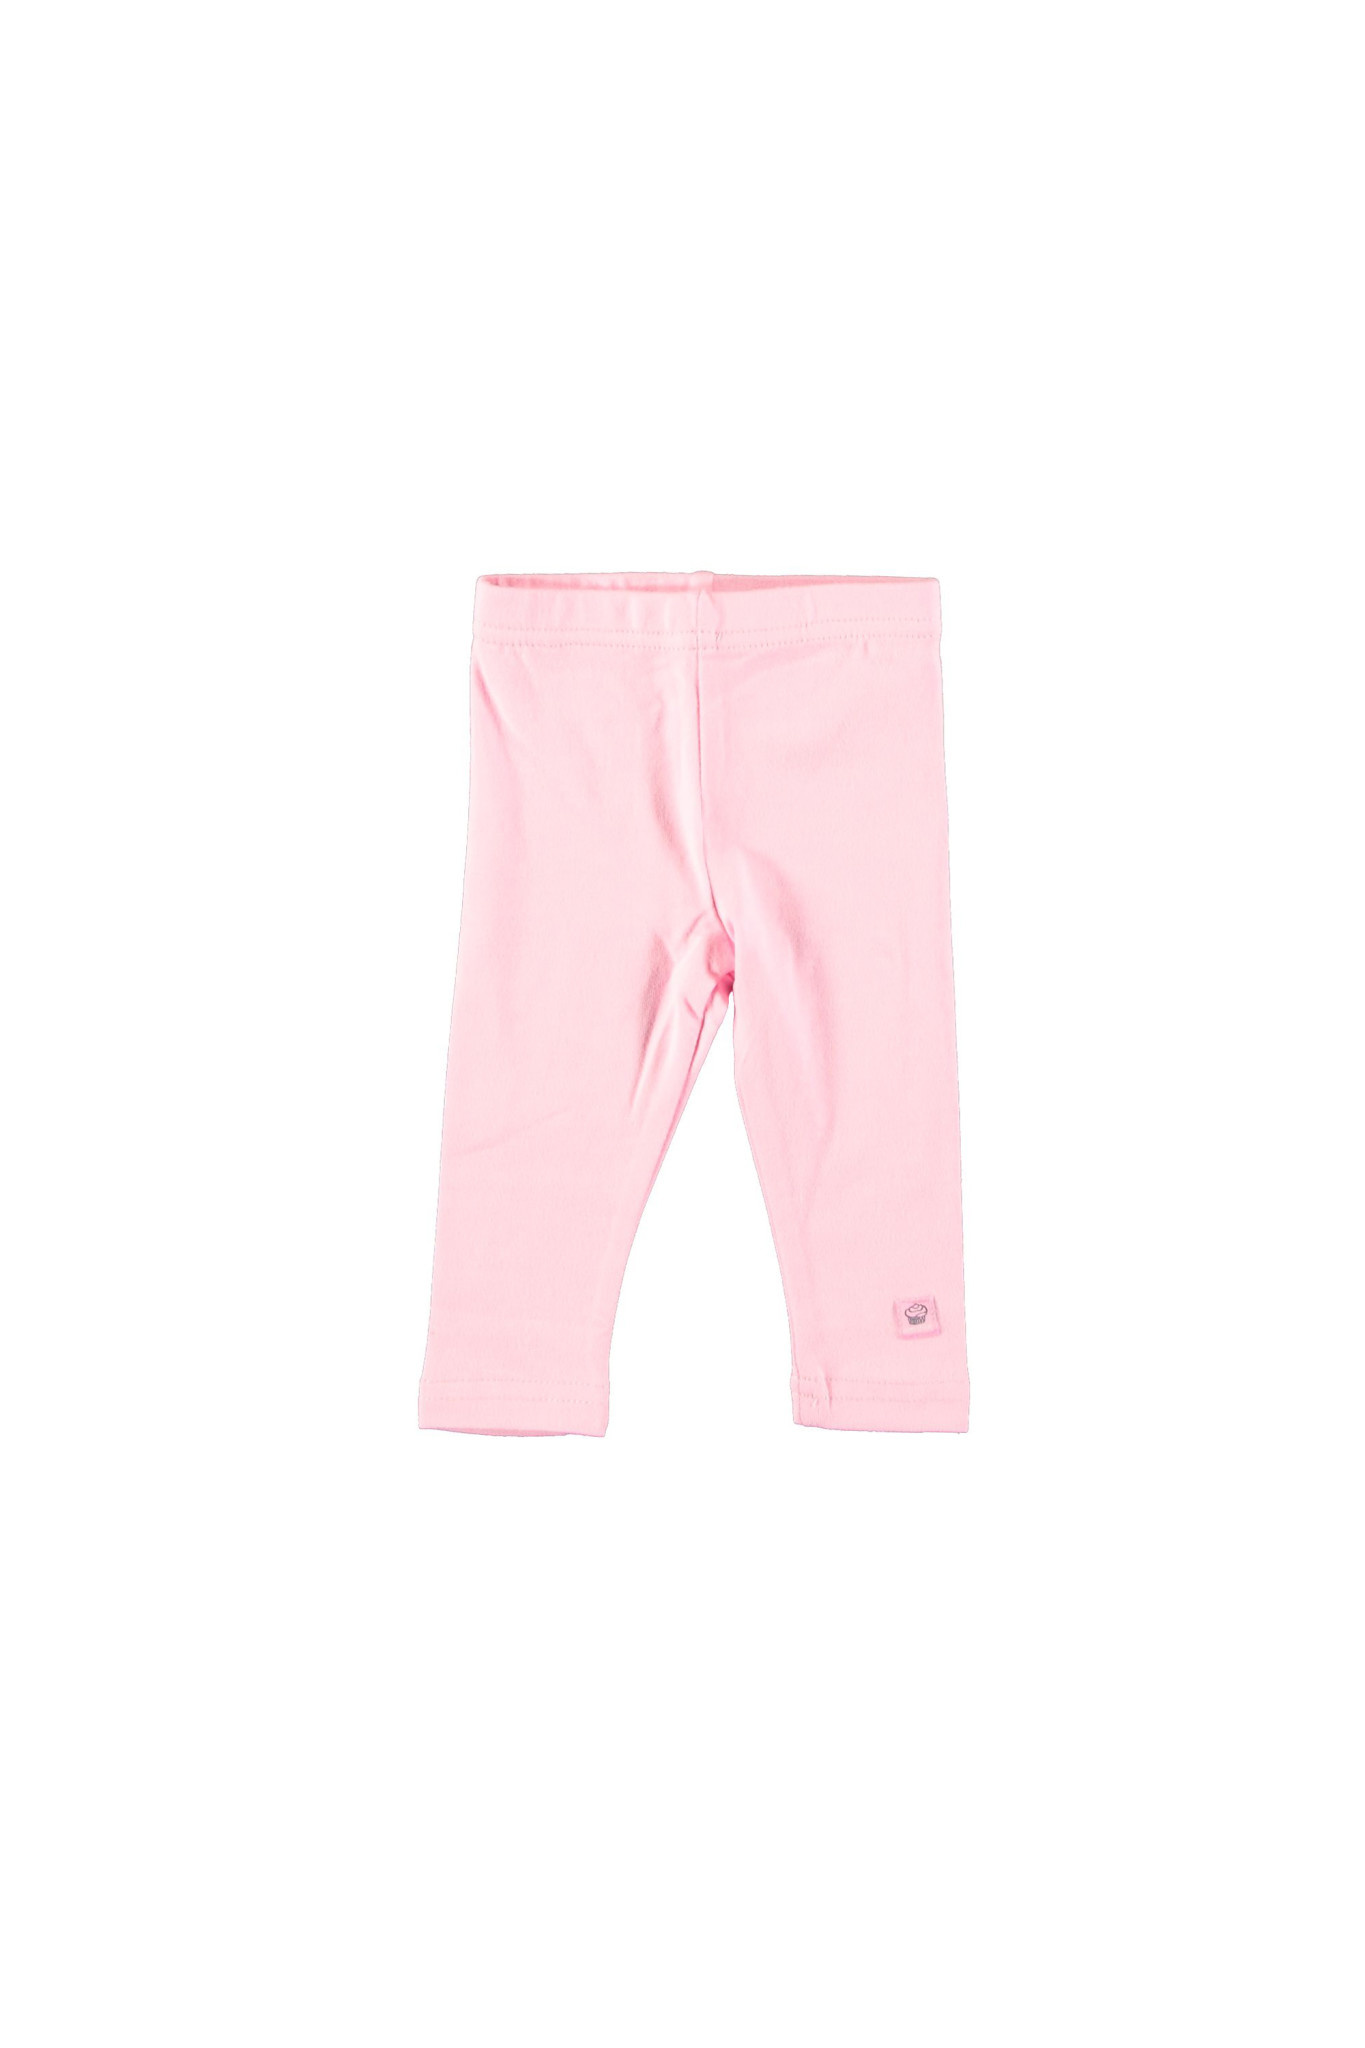 Bampidano Bampidano legging mini plain pink